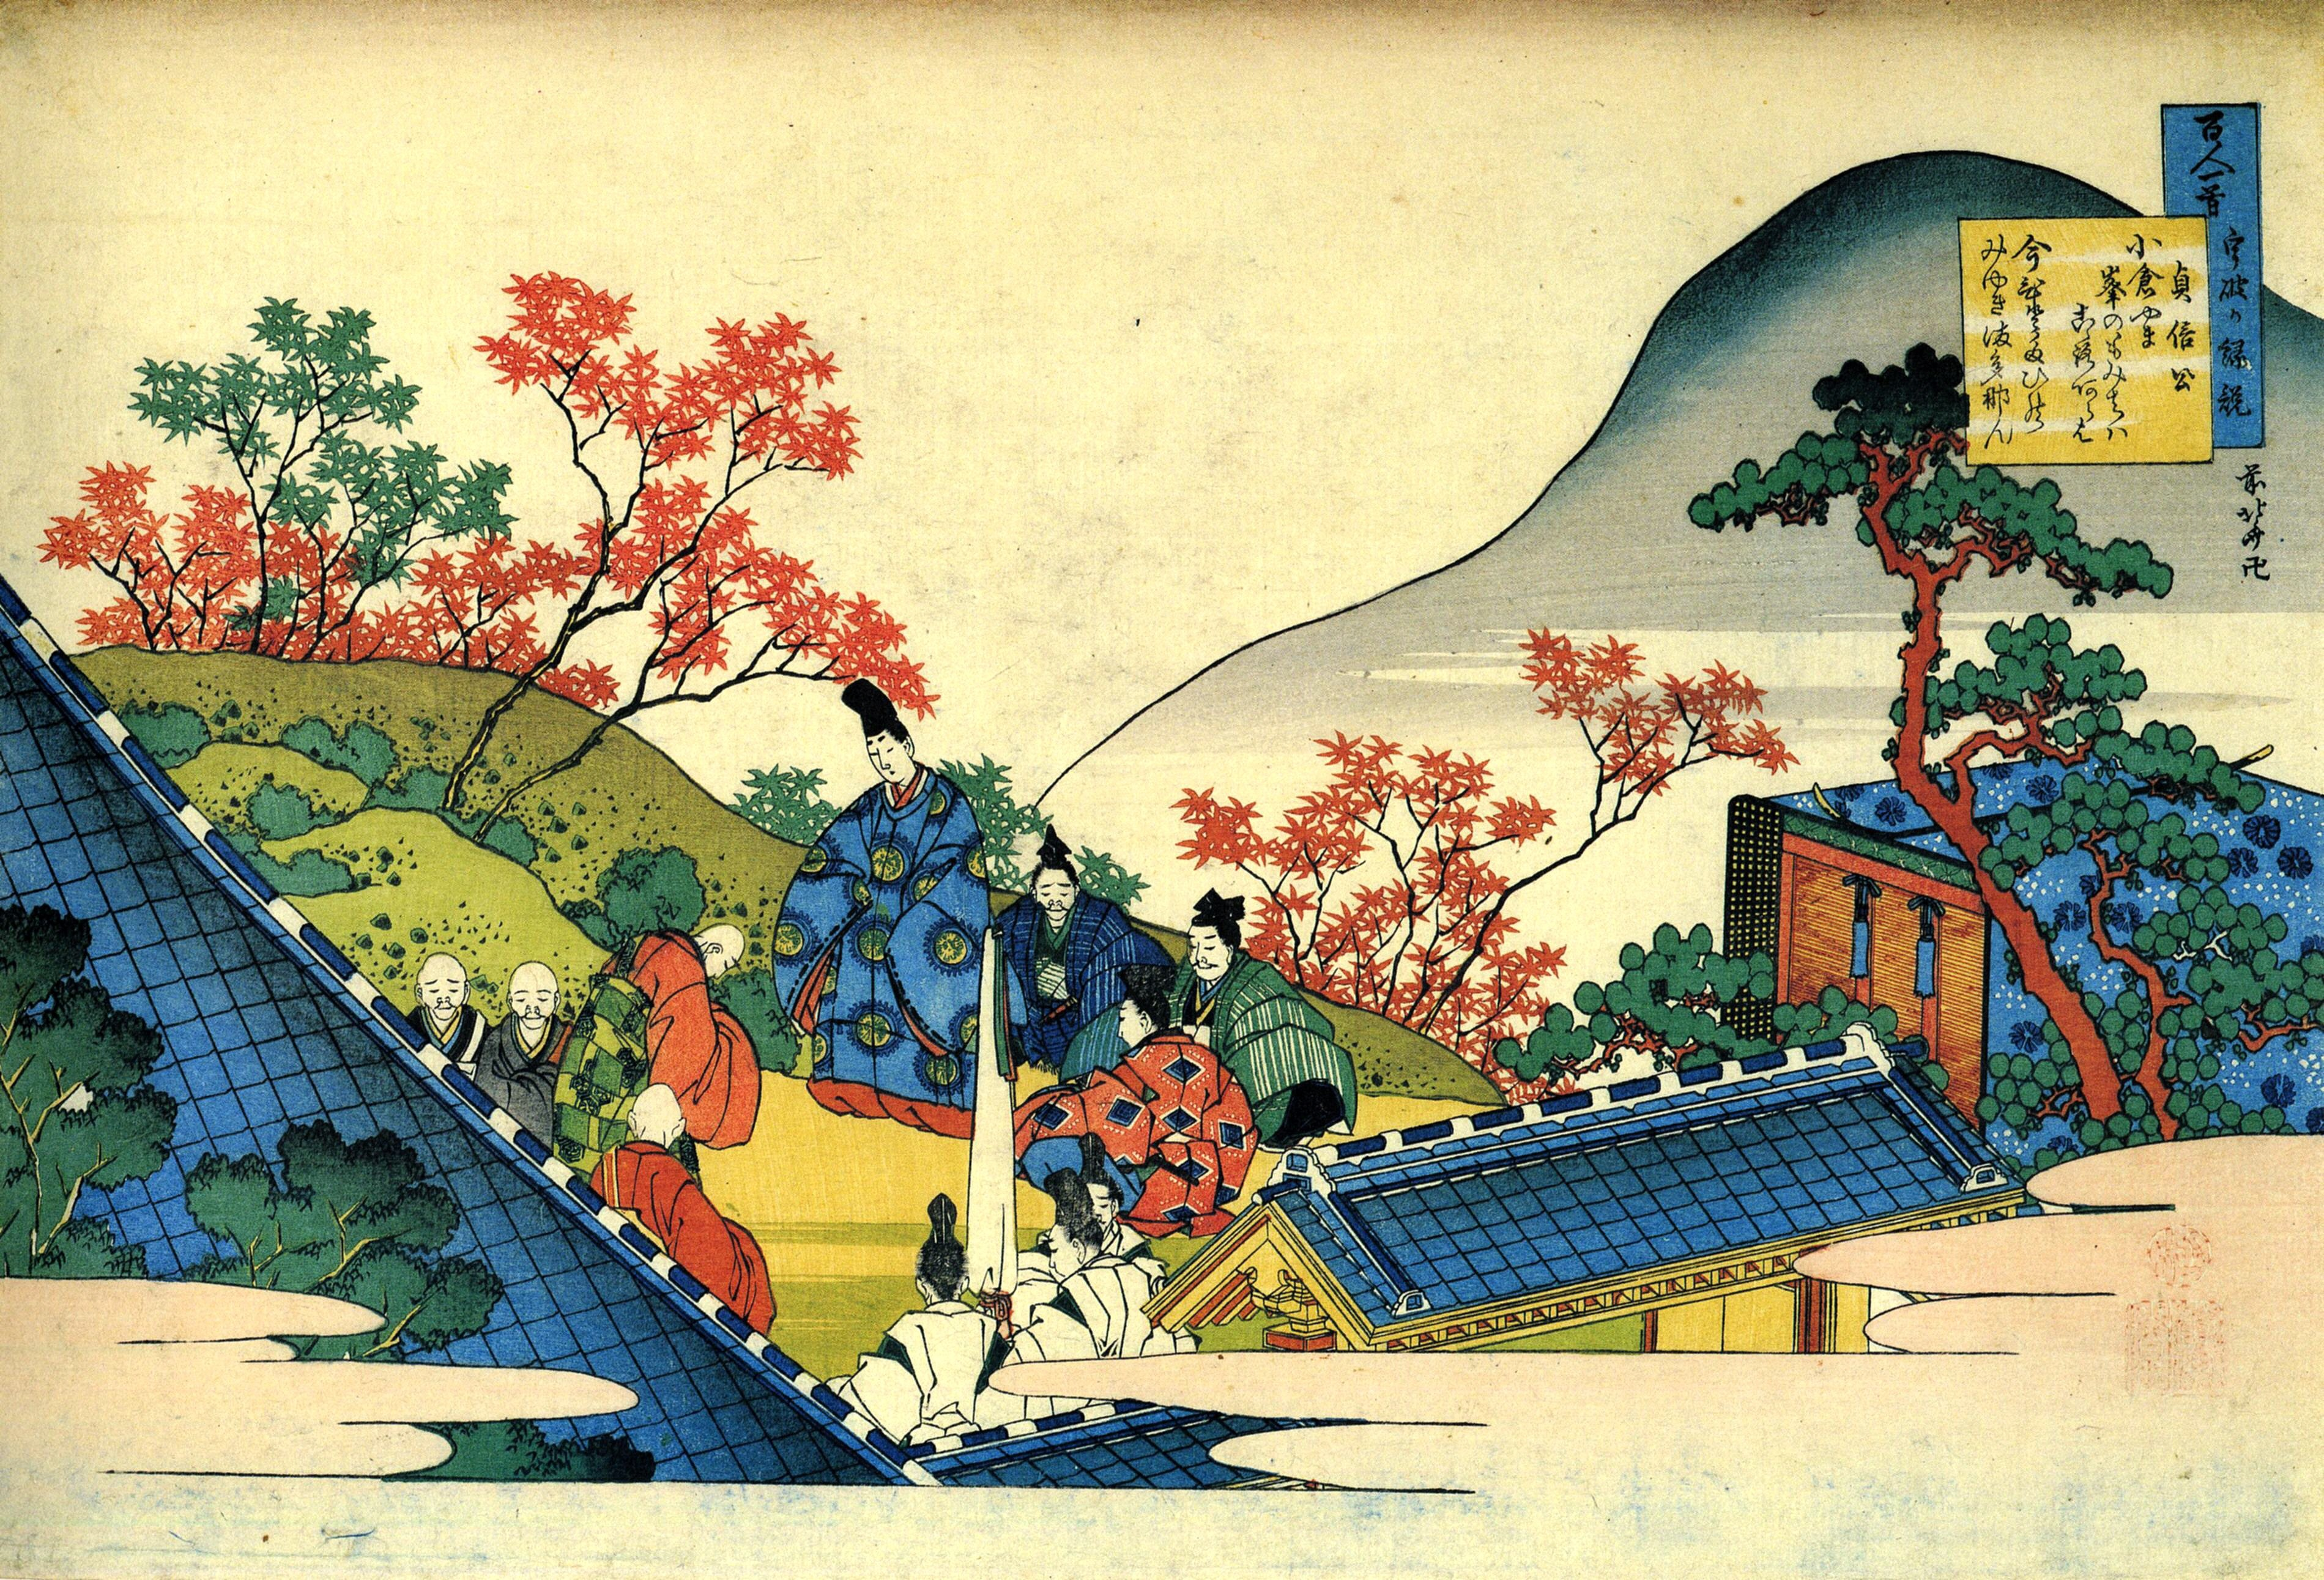 Desktop Wallpaper Hokusai h682536 Comics HD Images 3799x2583